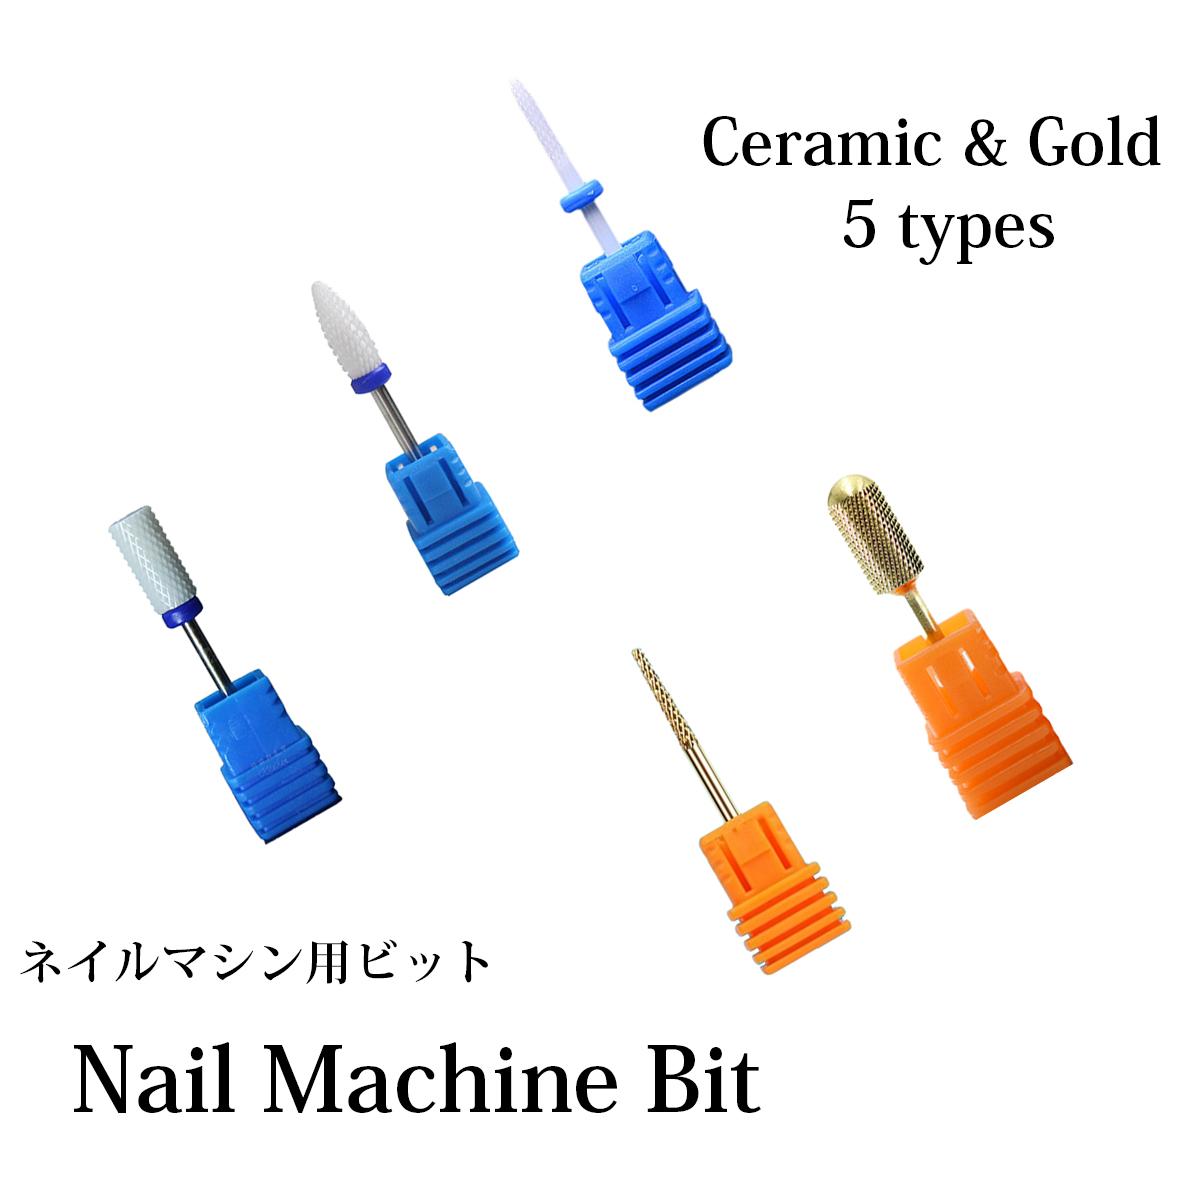 【LUGX】ラッグス ネイルマシン用 セラミック/ゴールド